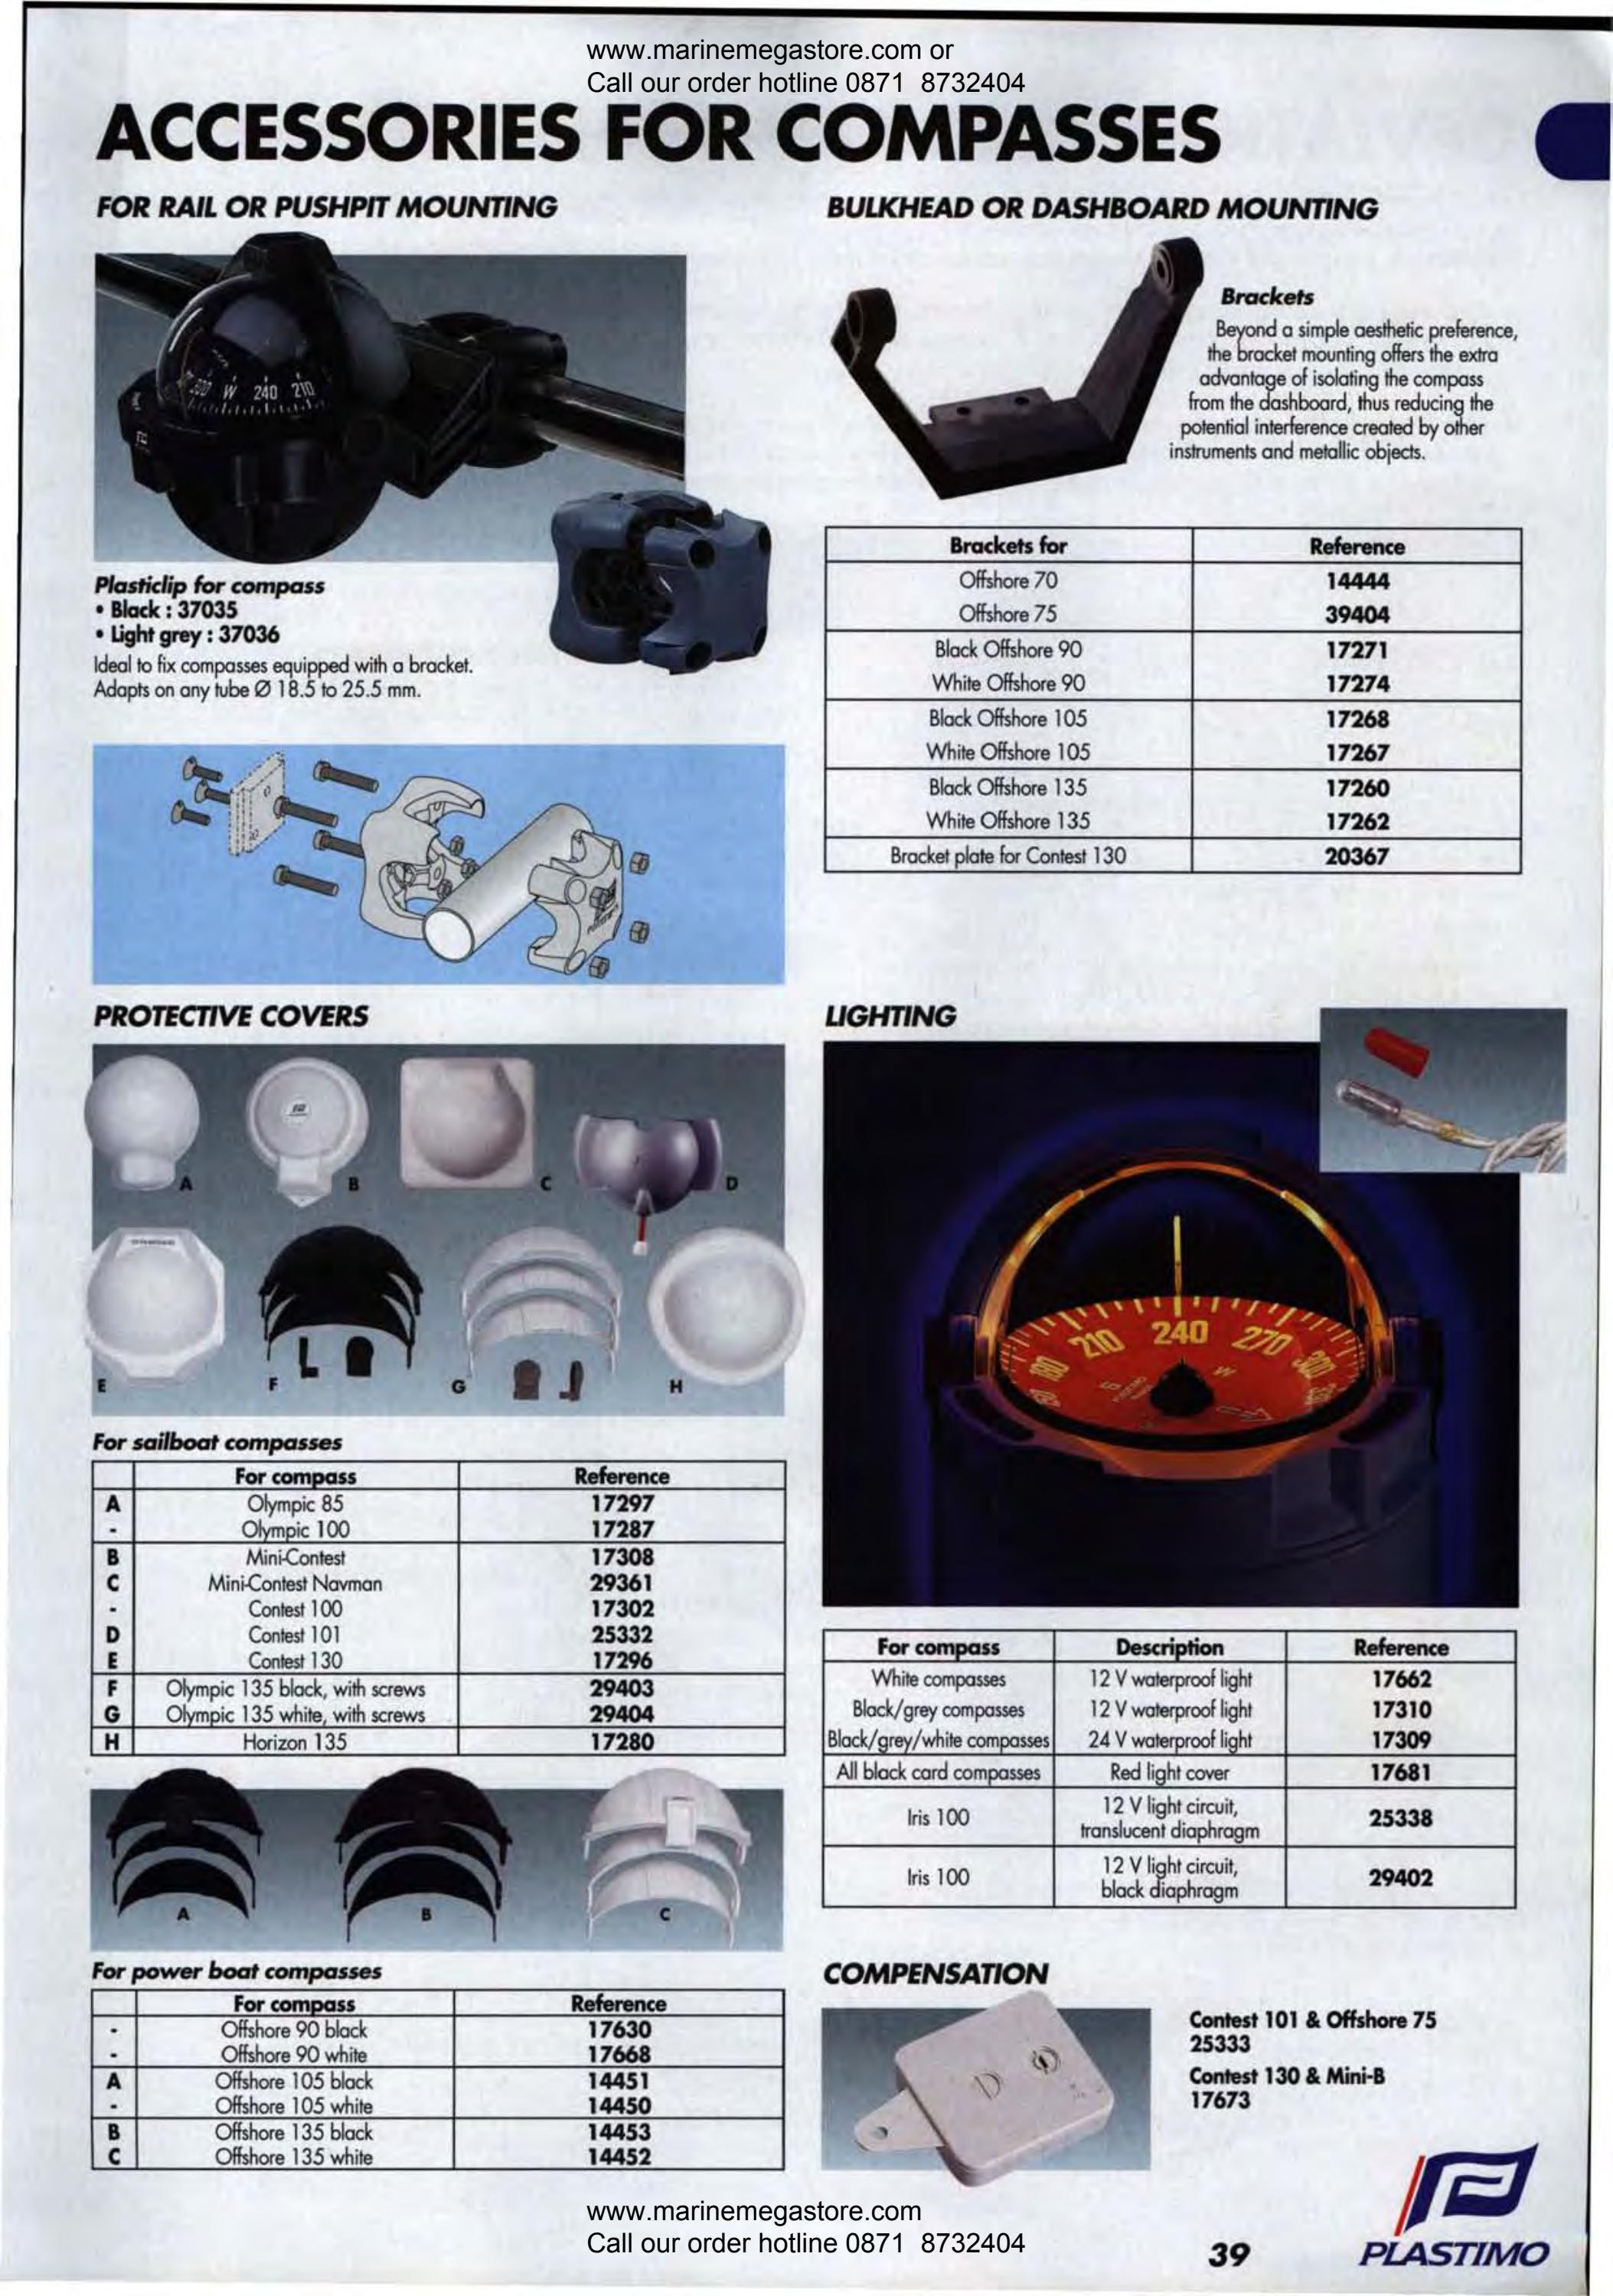 PLASTIMO OFFSHORE 90 COMPASS PROTECTIVE COVER  BLACK  17630